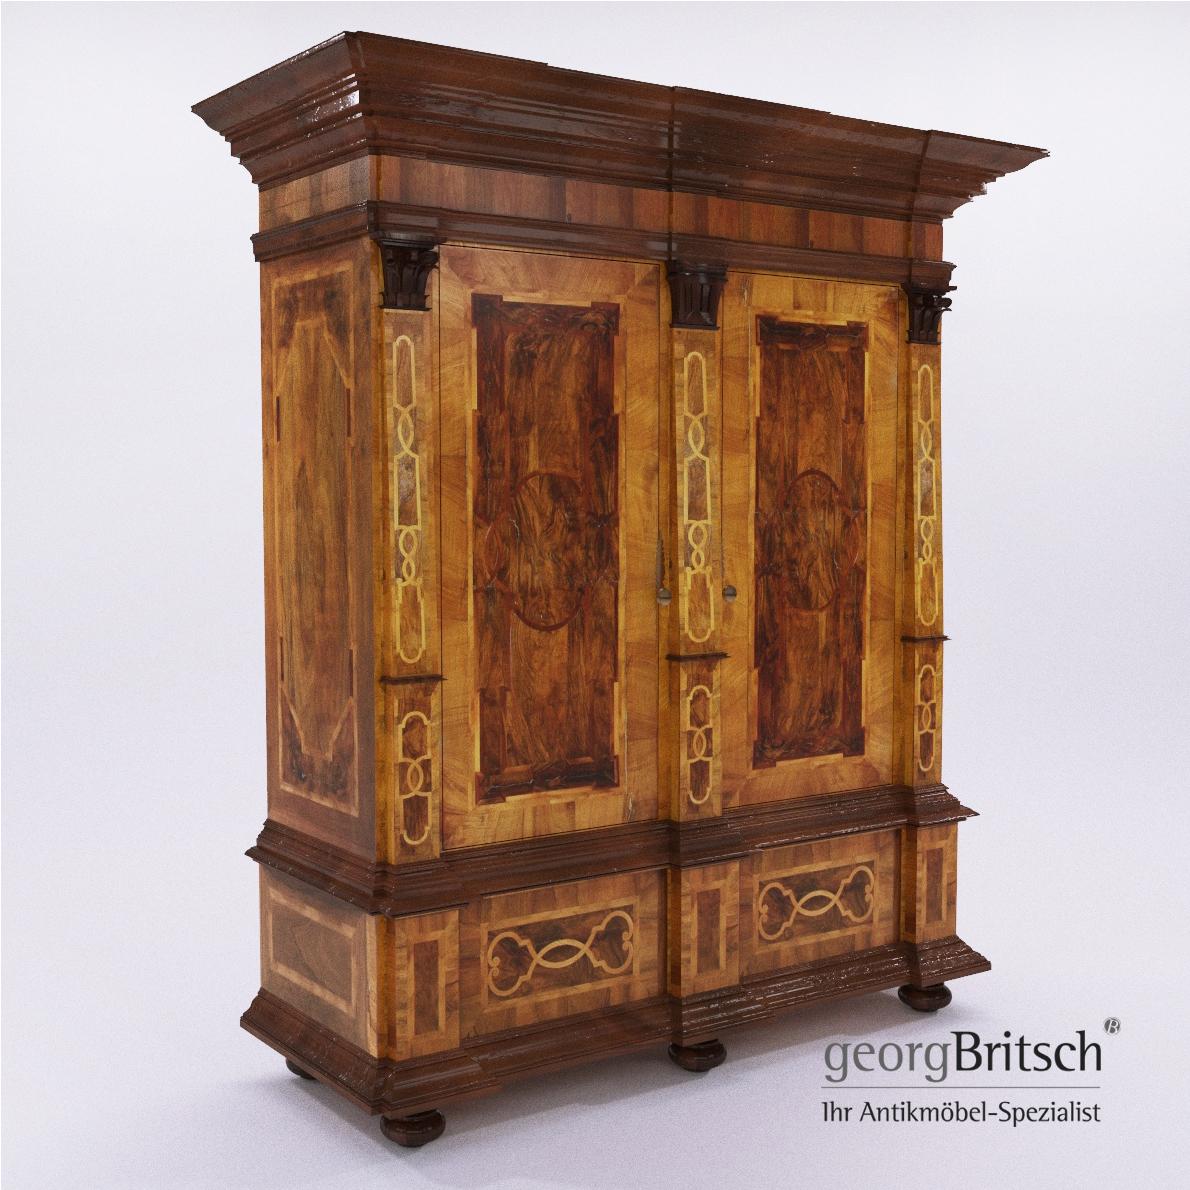 Baroque Cupboard Georg Britsch 3d Realistic Model